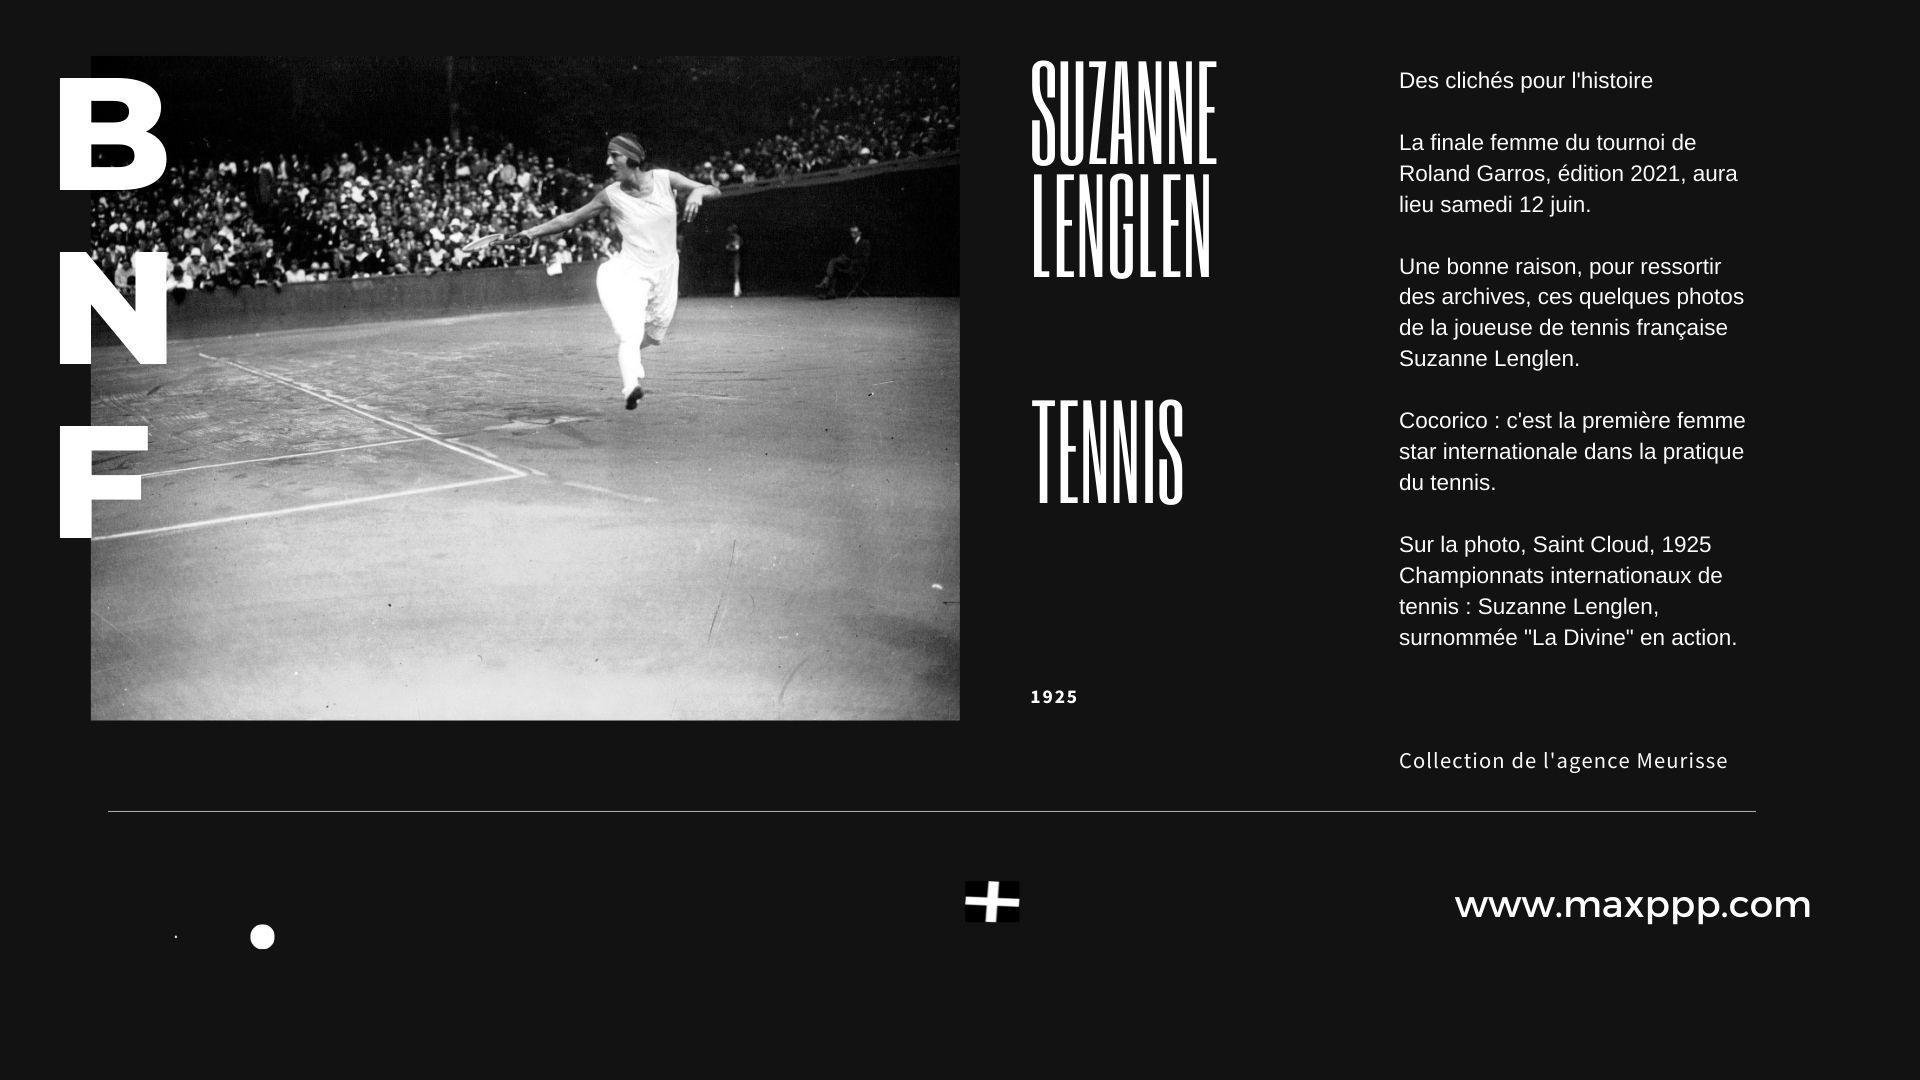 Suzanne Lenglen, 1925